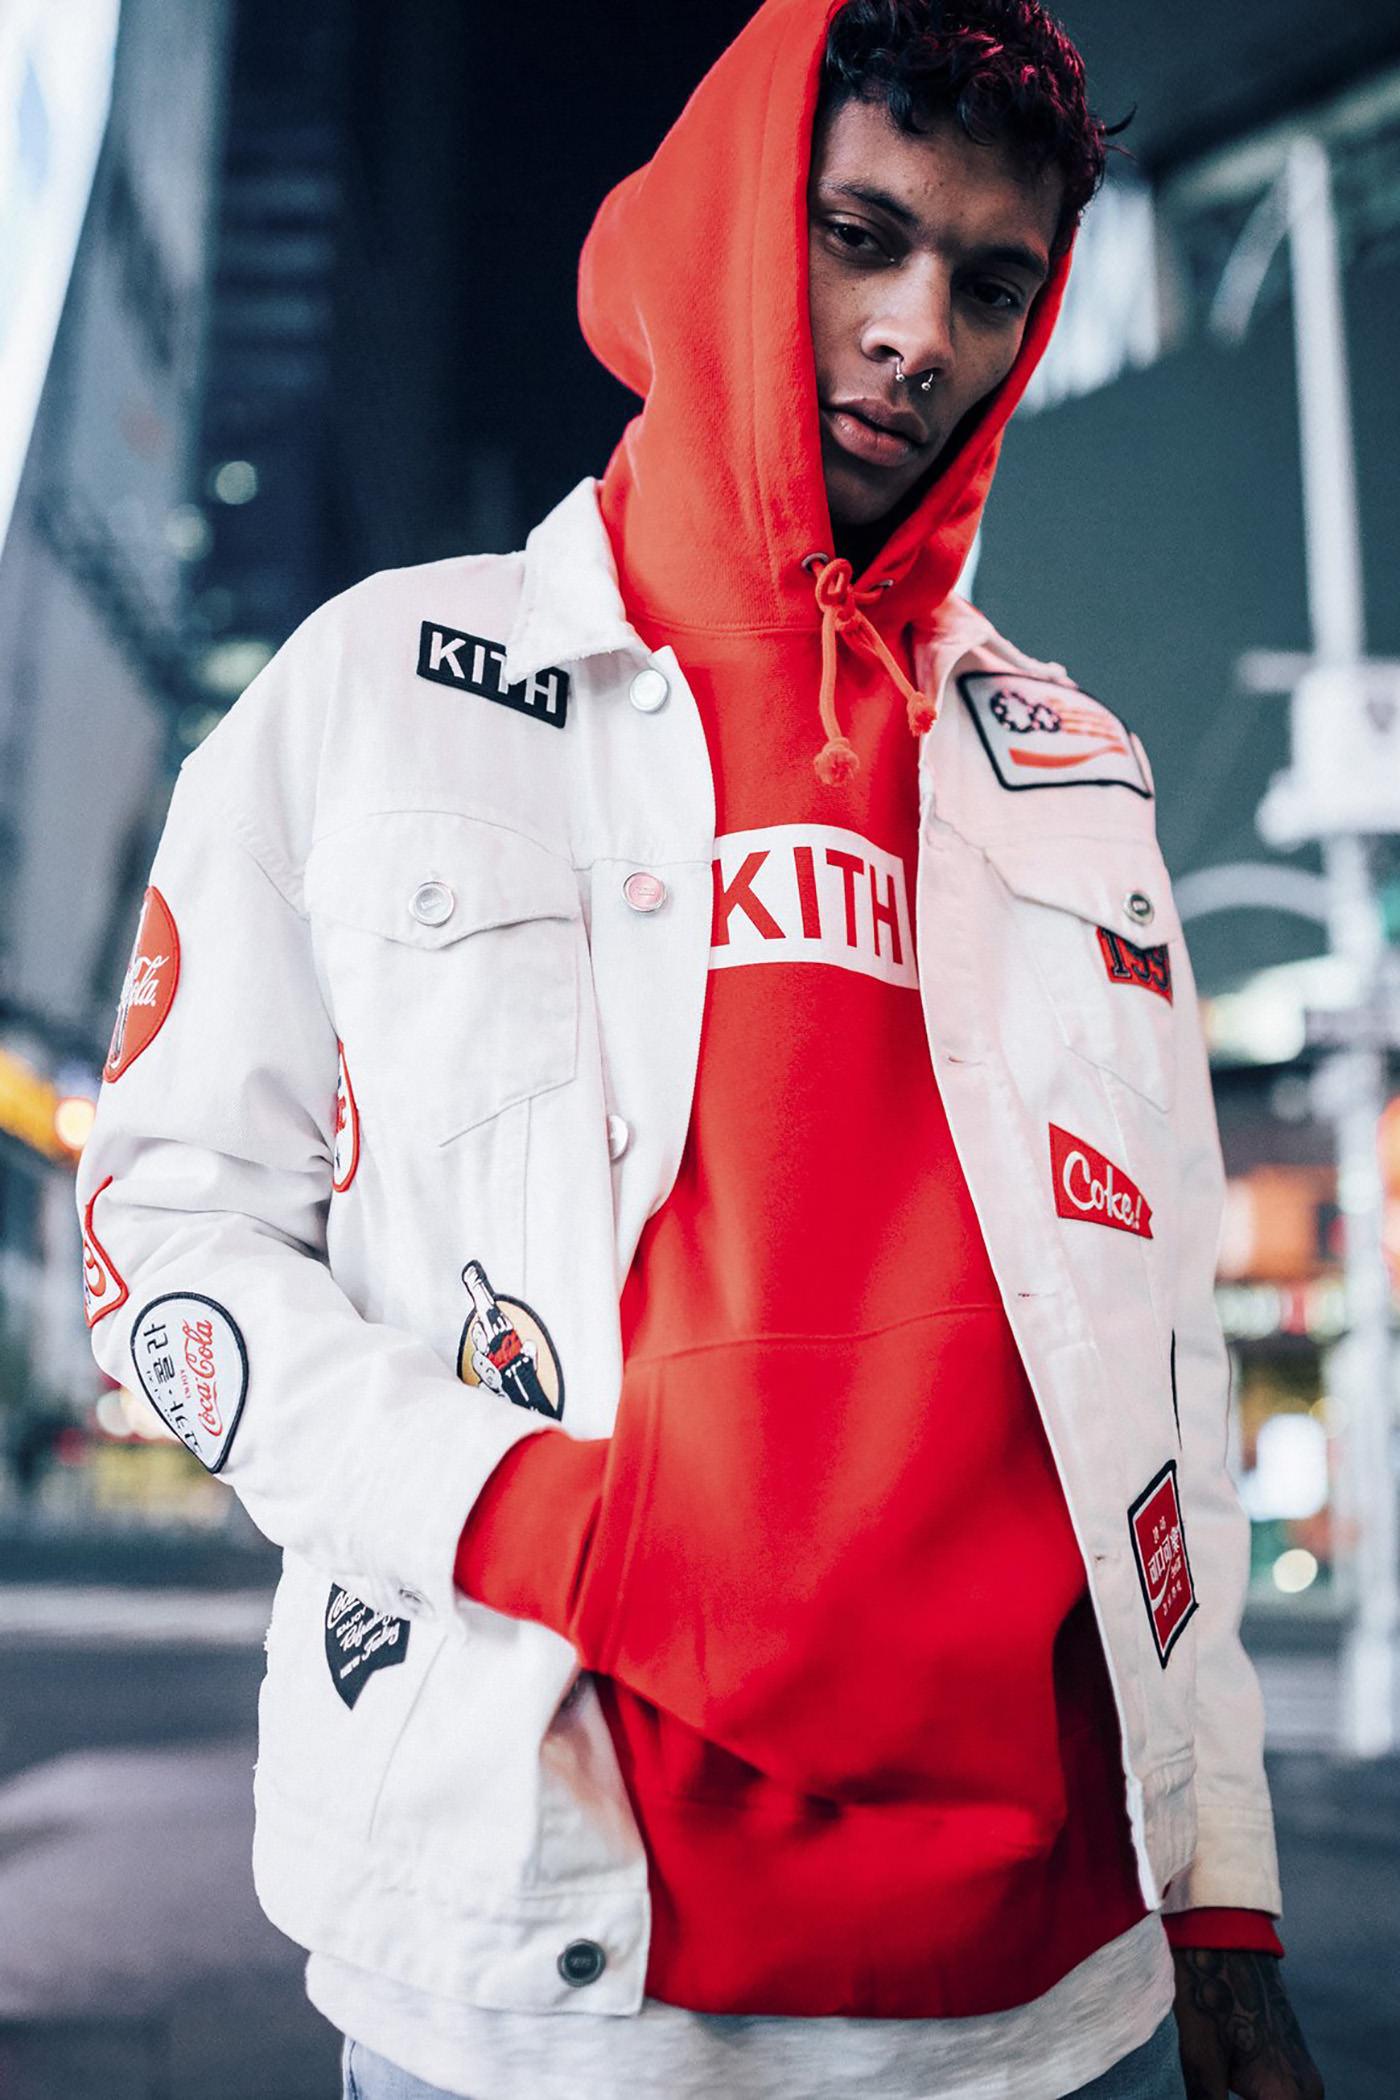 kith-coca-cola-collab-007